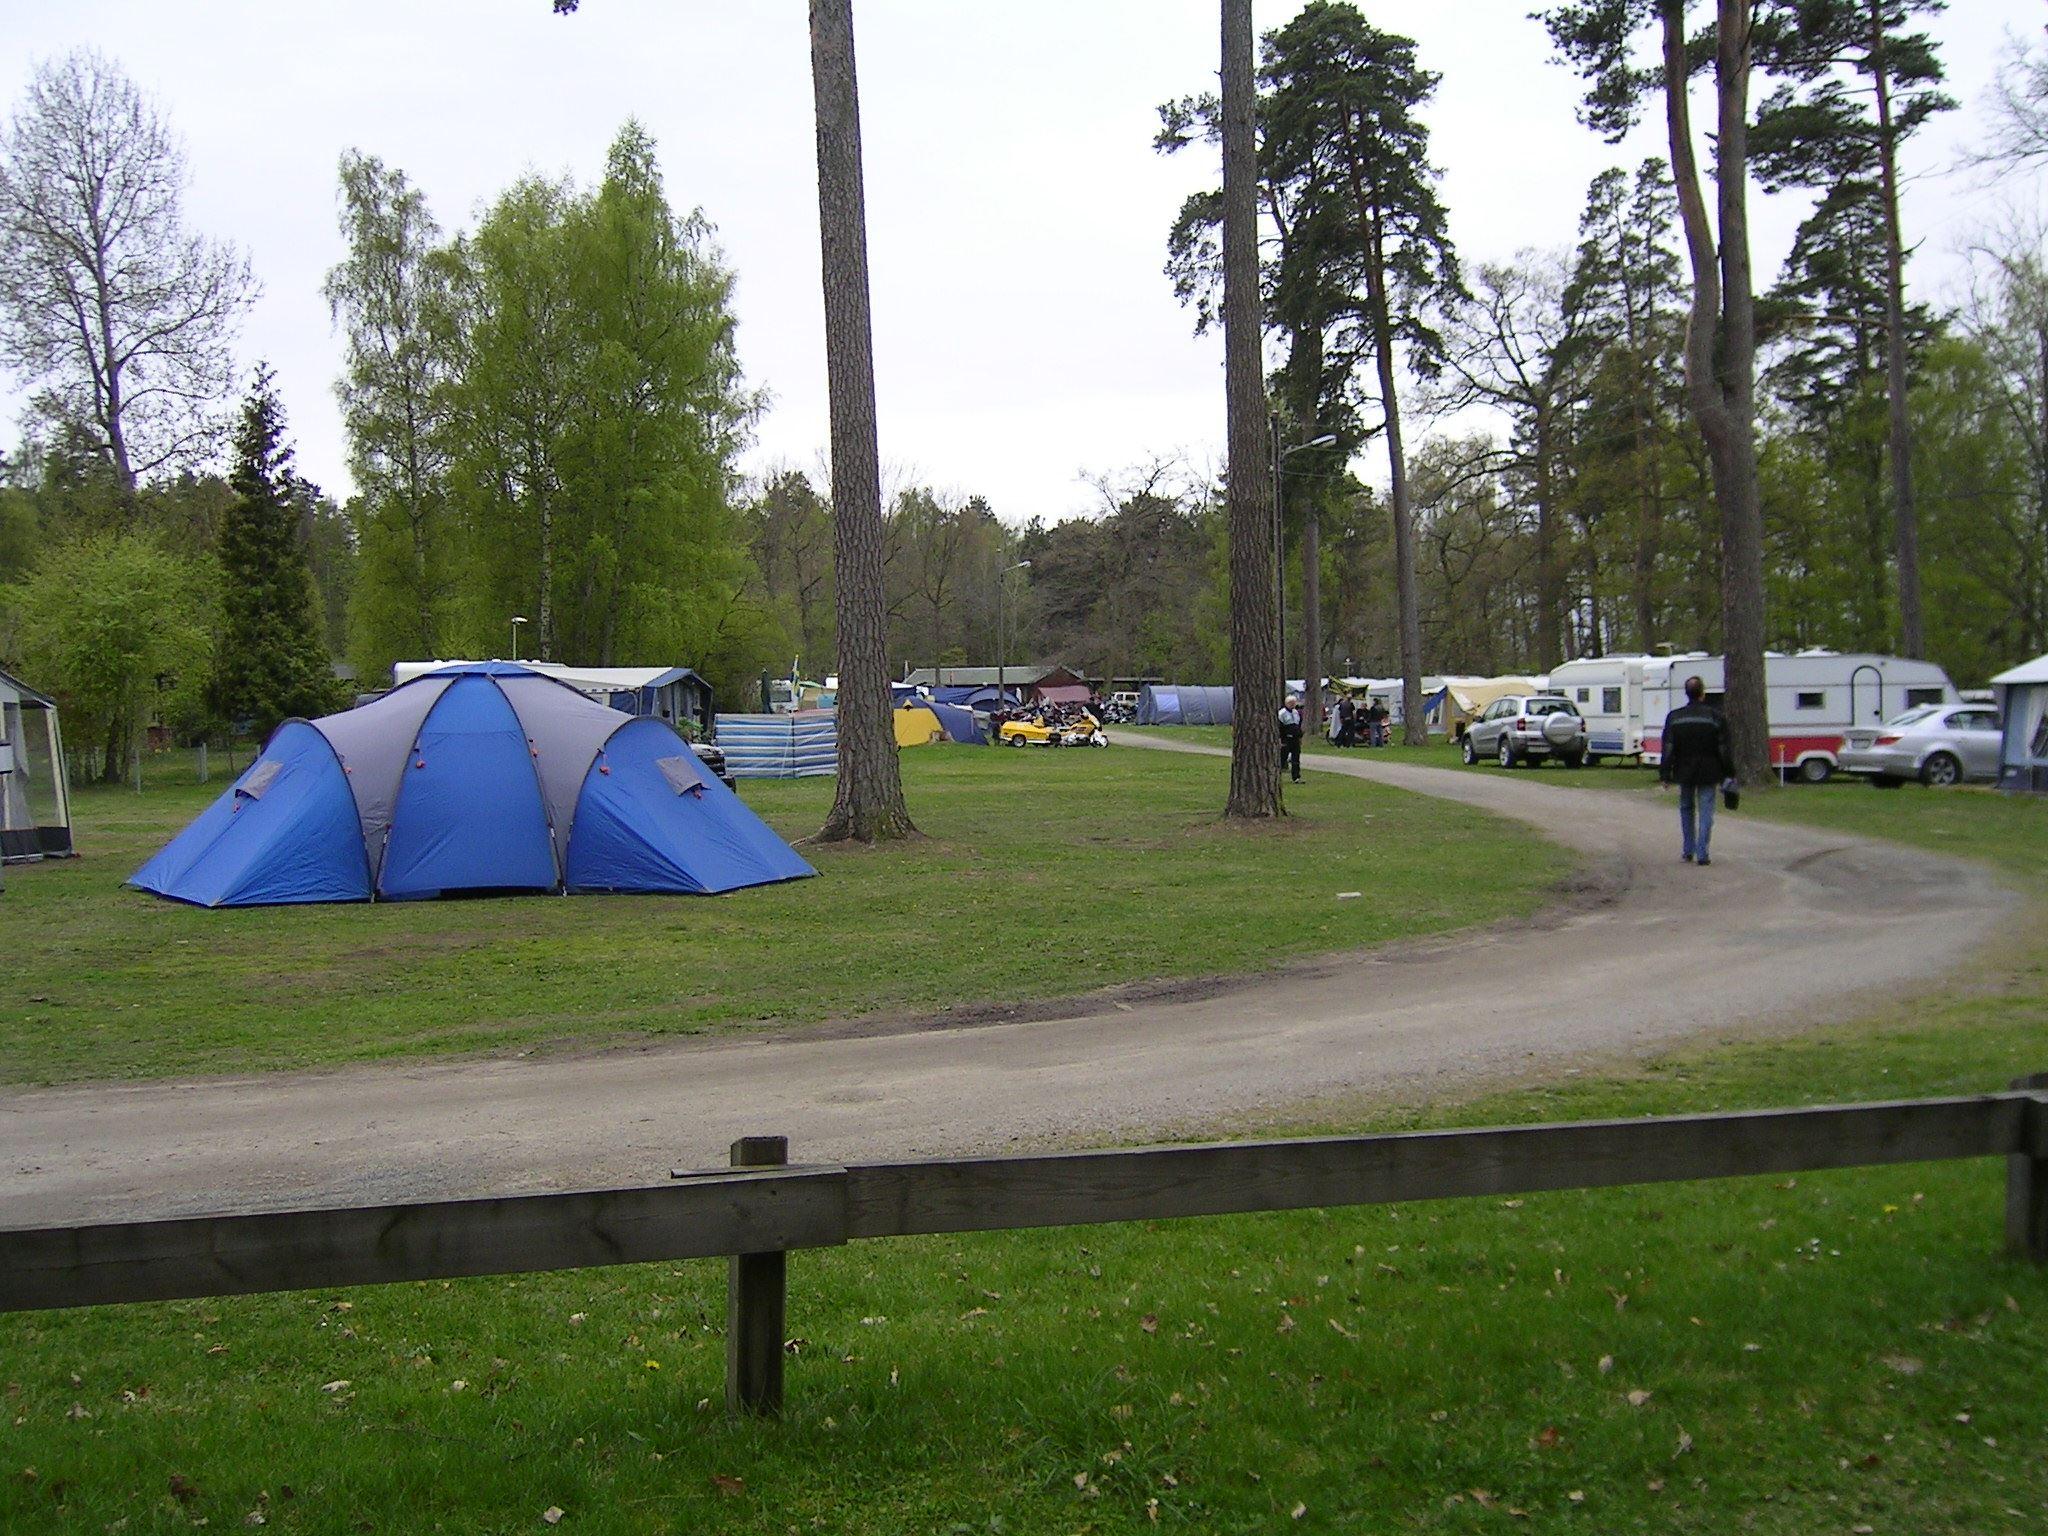 Bromölla Camping & Vandrarhem/Camping